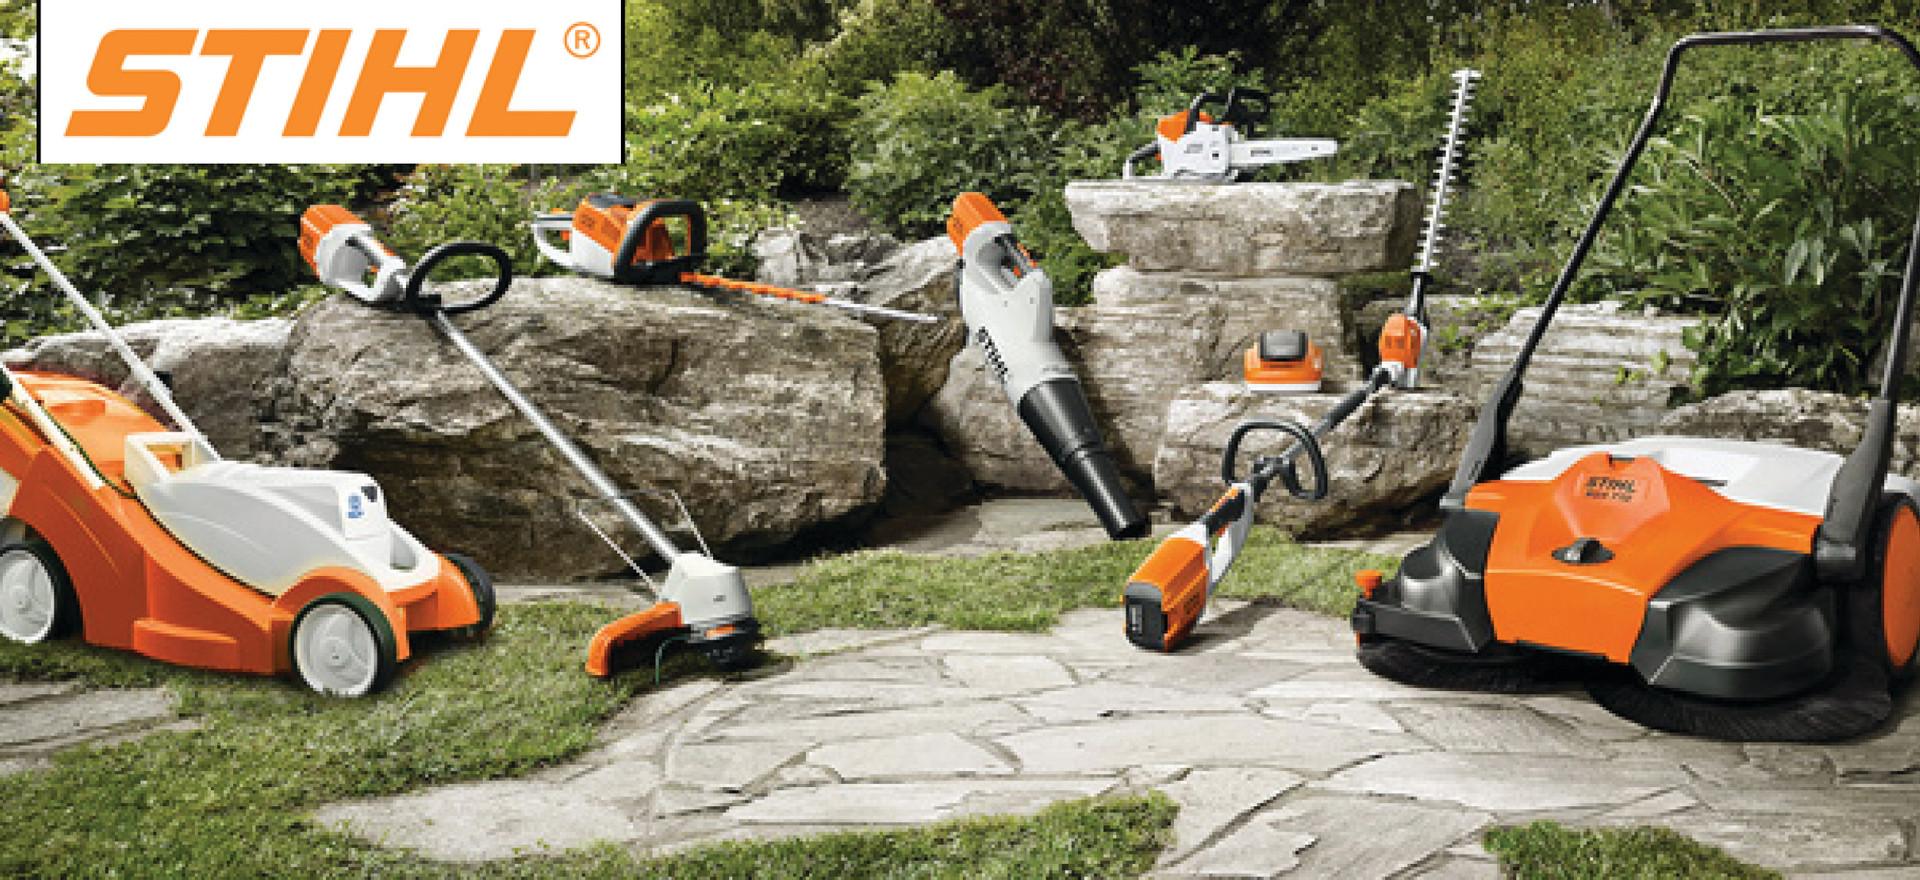 STIHL Power Garden Tools